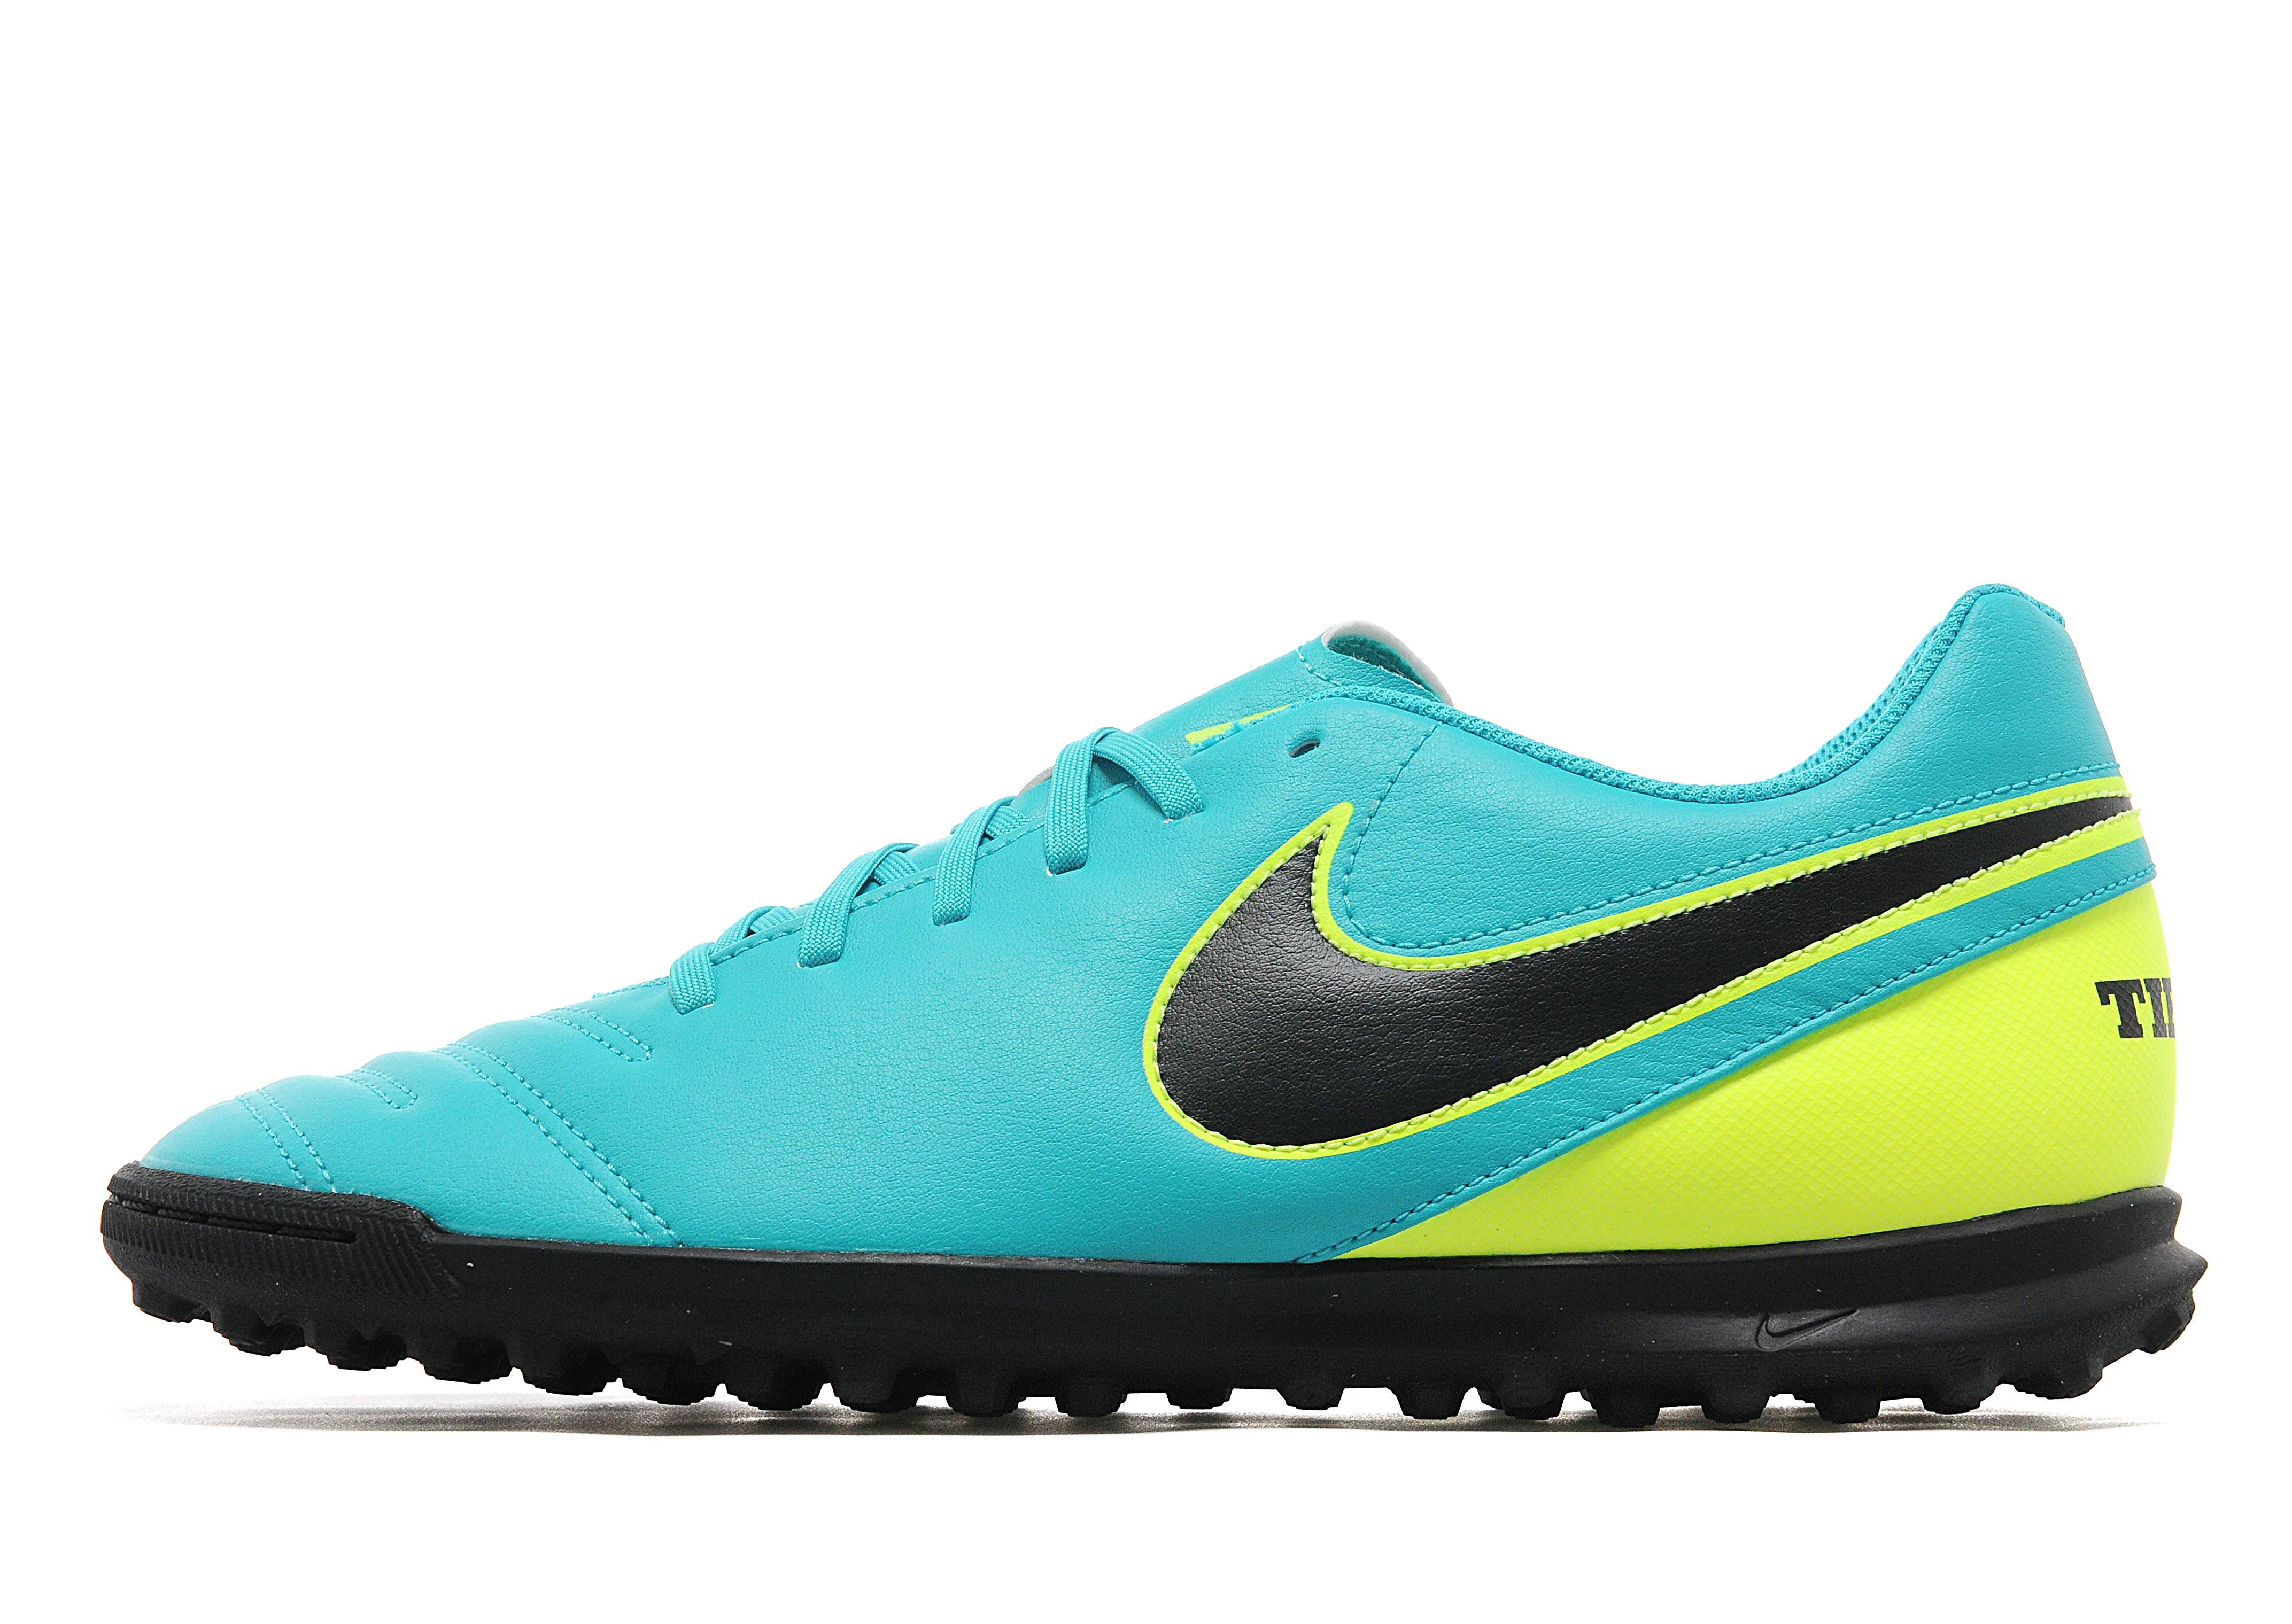 Nike Spark Brilliance Tiempo Rio Firm Ground